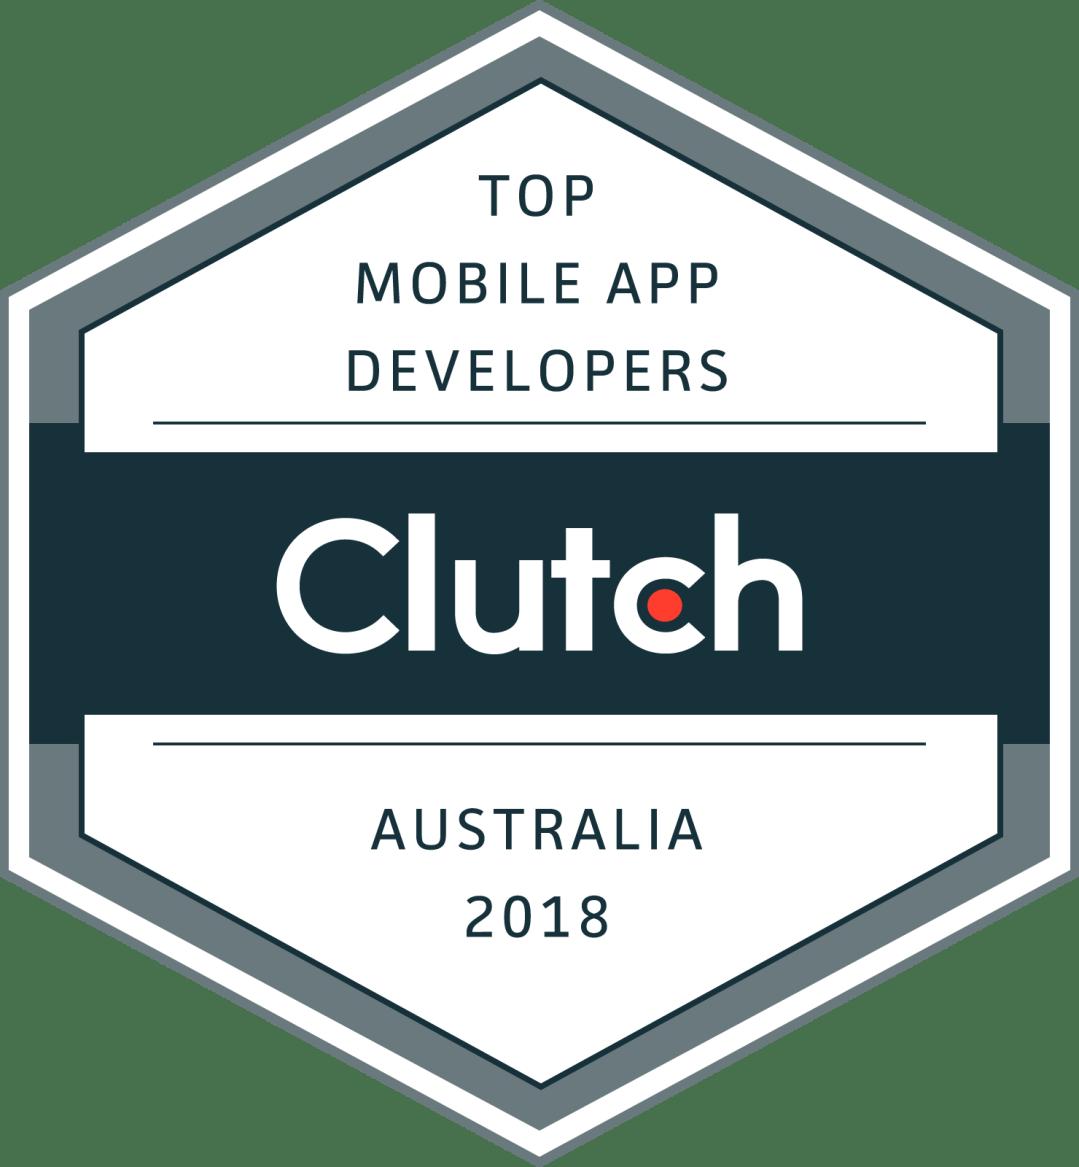 clutch DreamWalk top 5 app developers in Australia